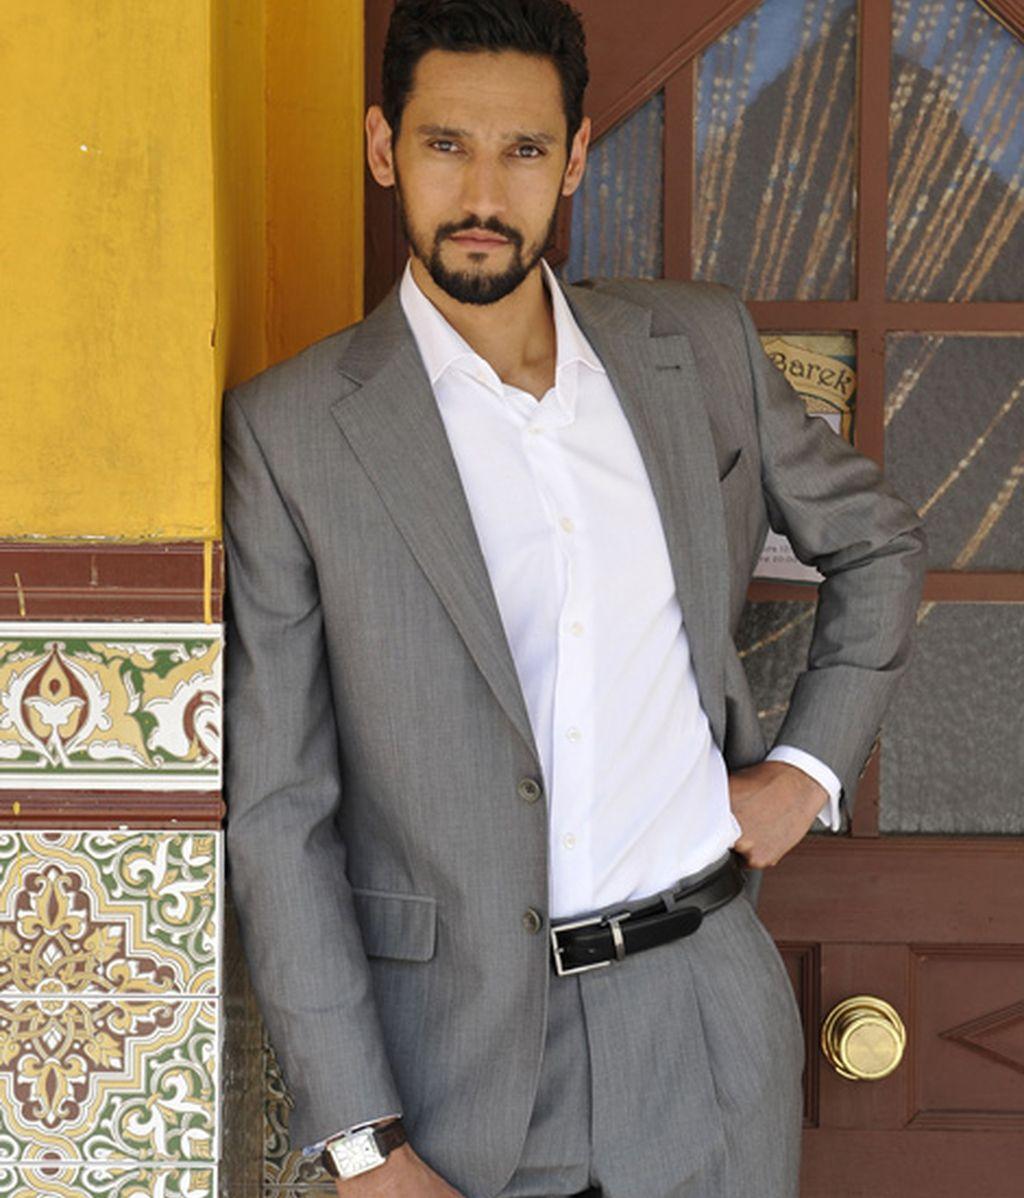 Stany Coppet es Khaled, el prometido de Fátima